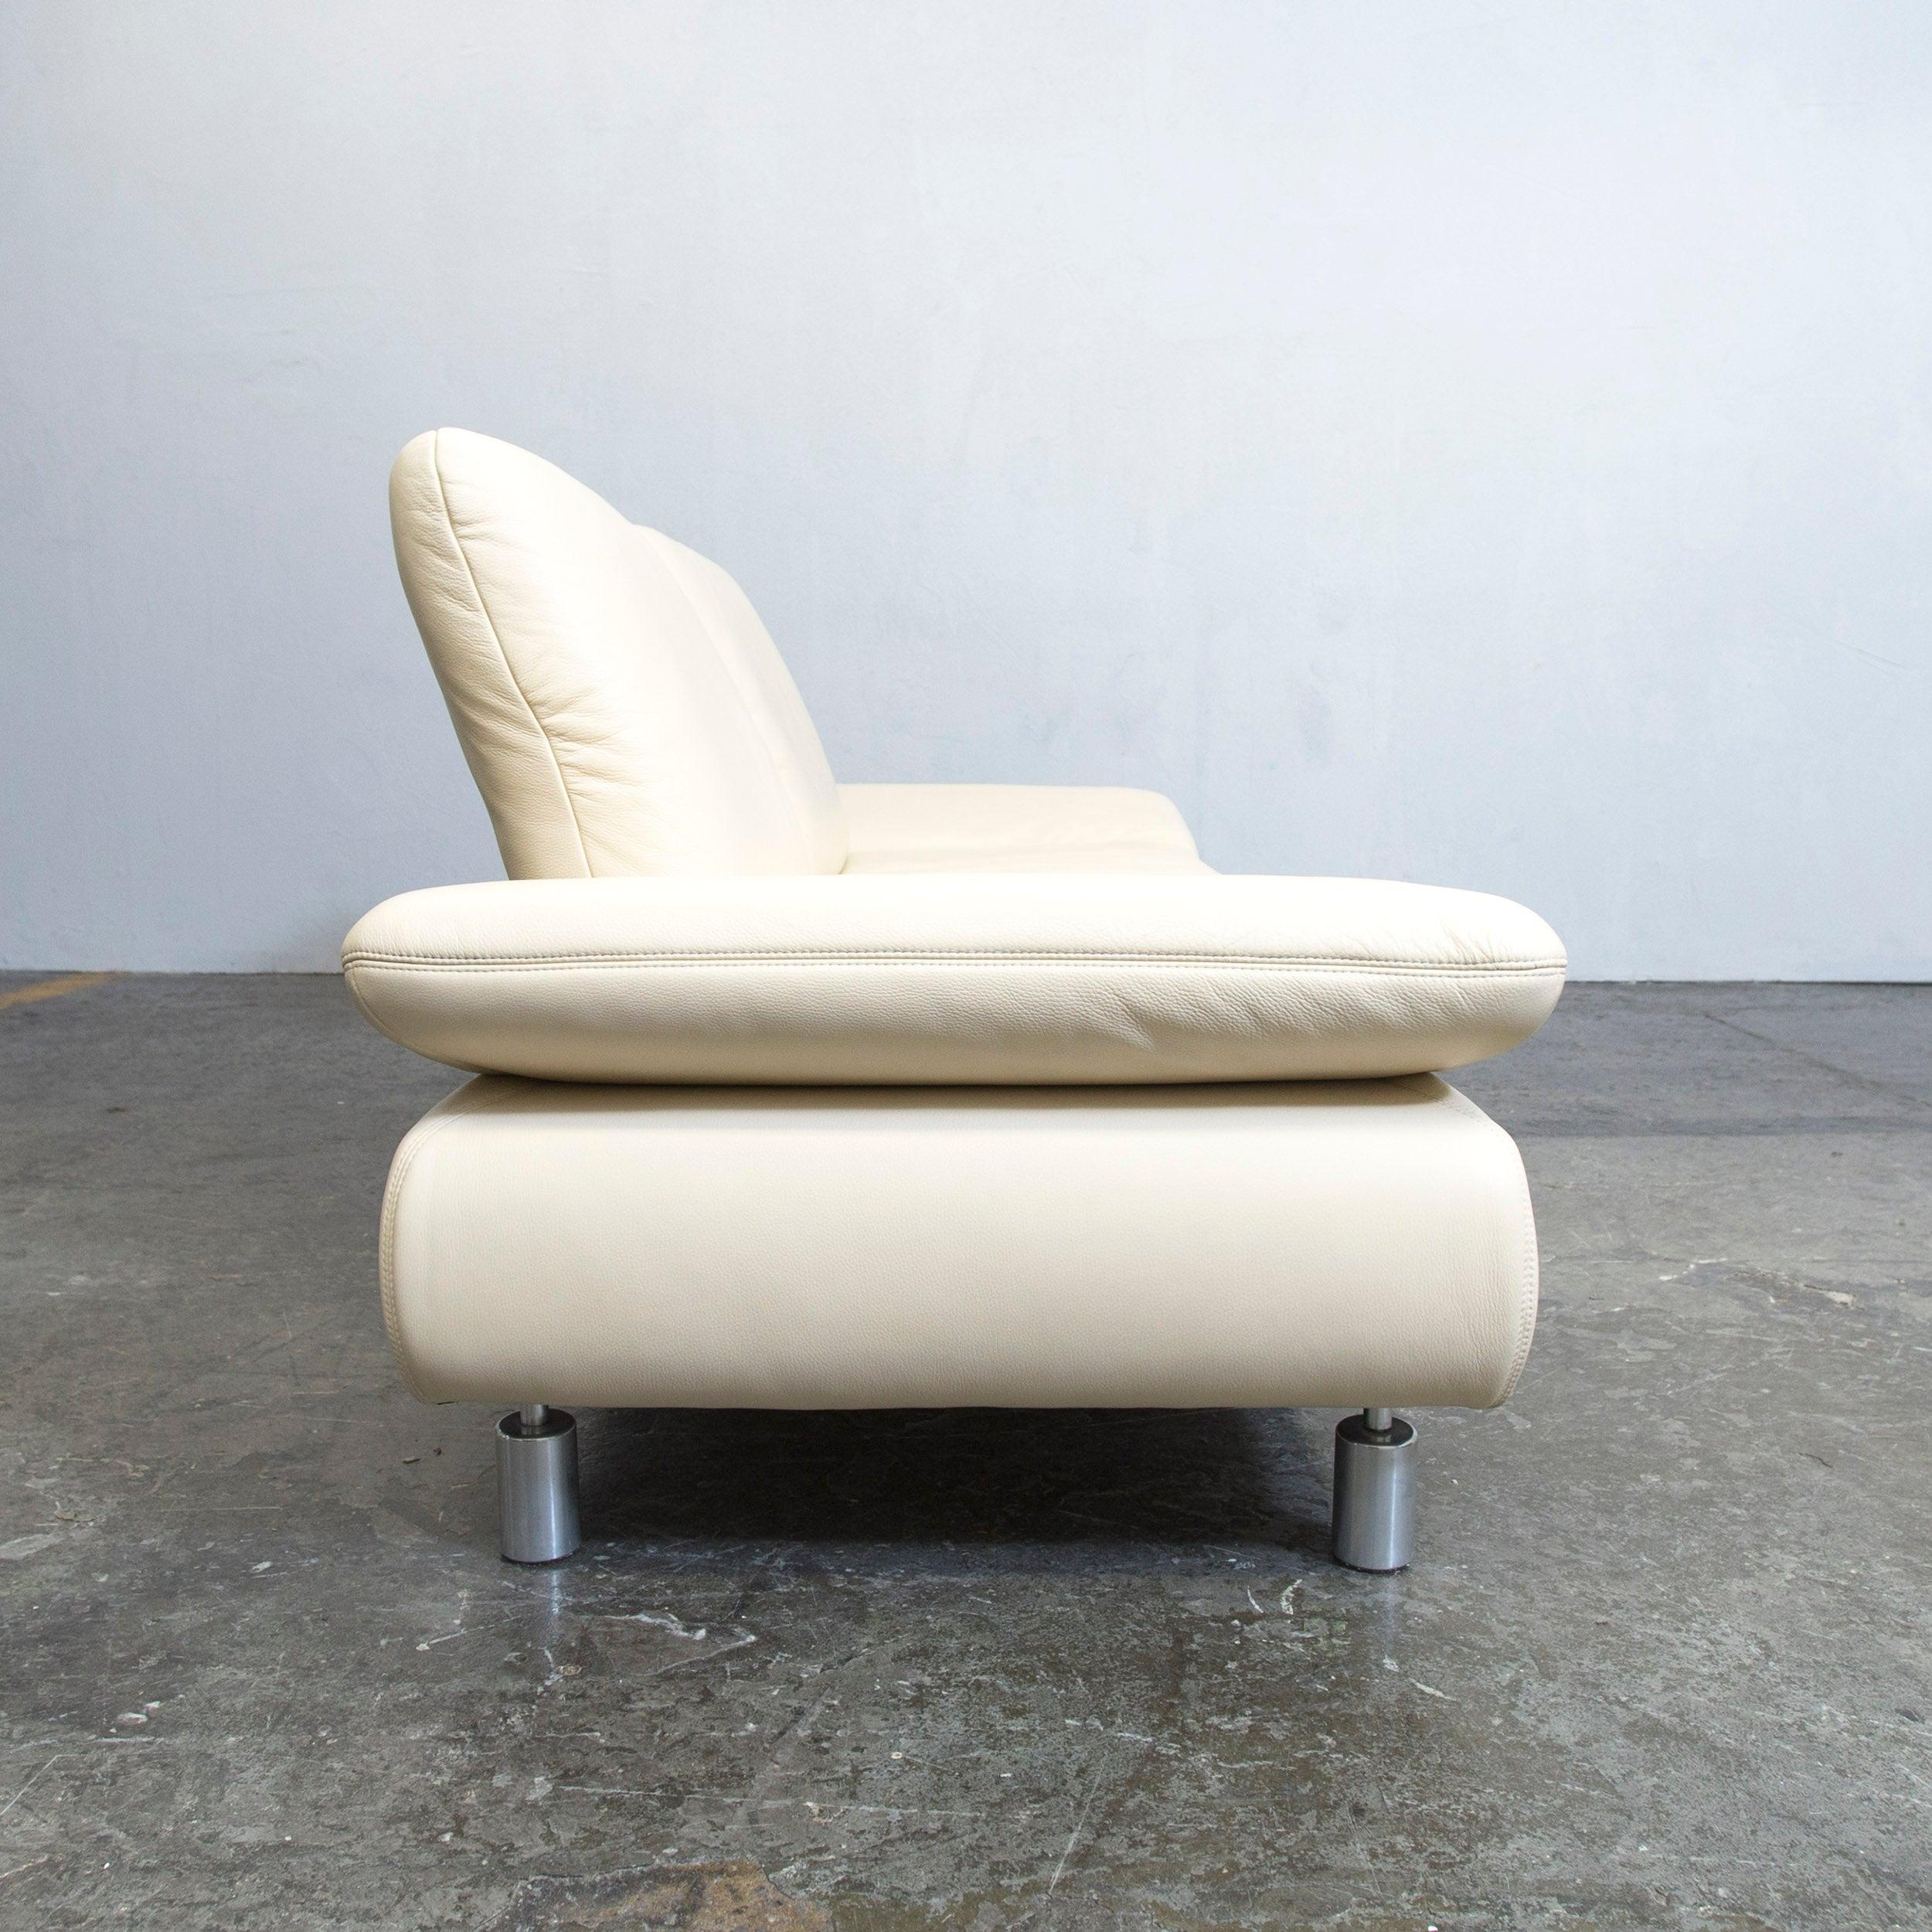 Stunning Koinor Rossini Designer Leather Sofa Crme White Threeseat Function  Modern At Stdibs With Designer Sthle Wei